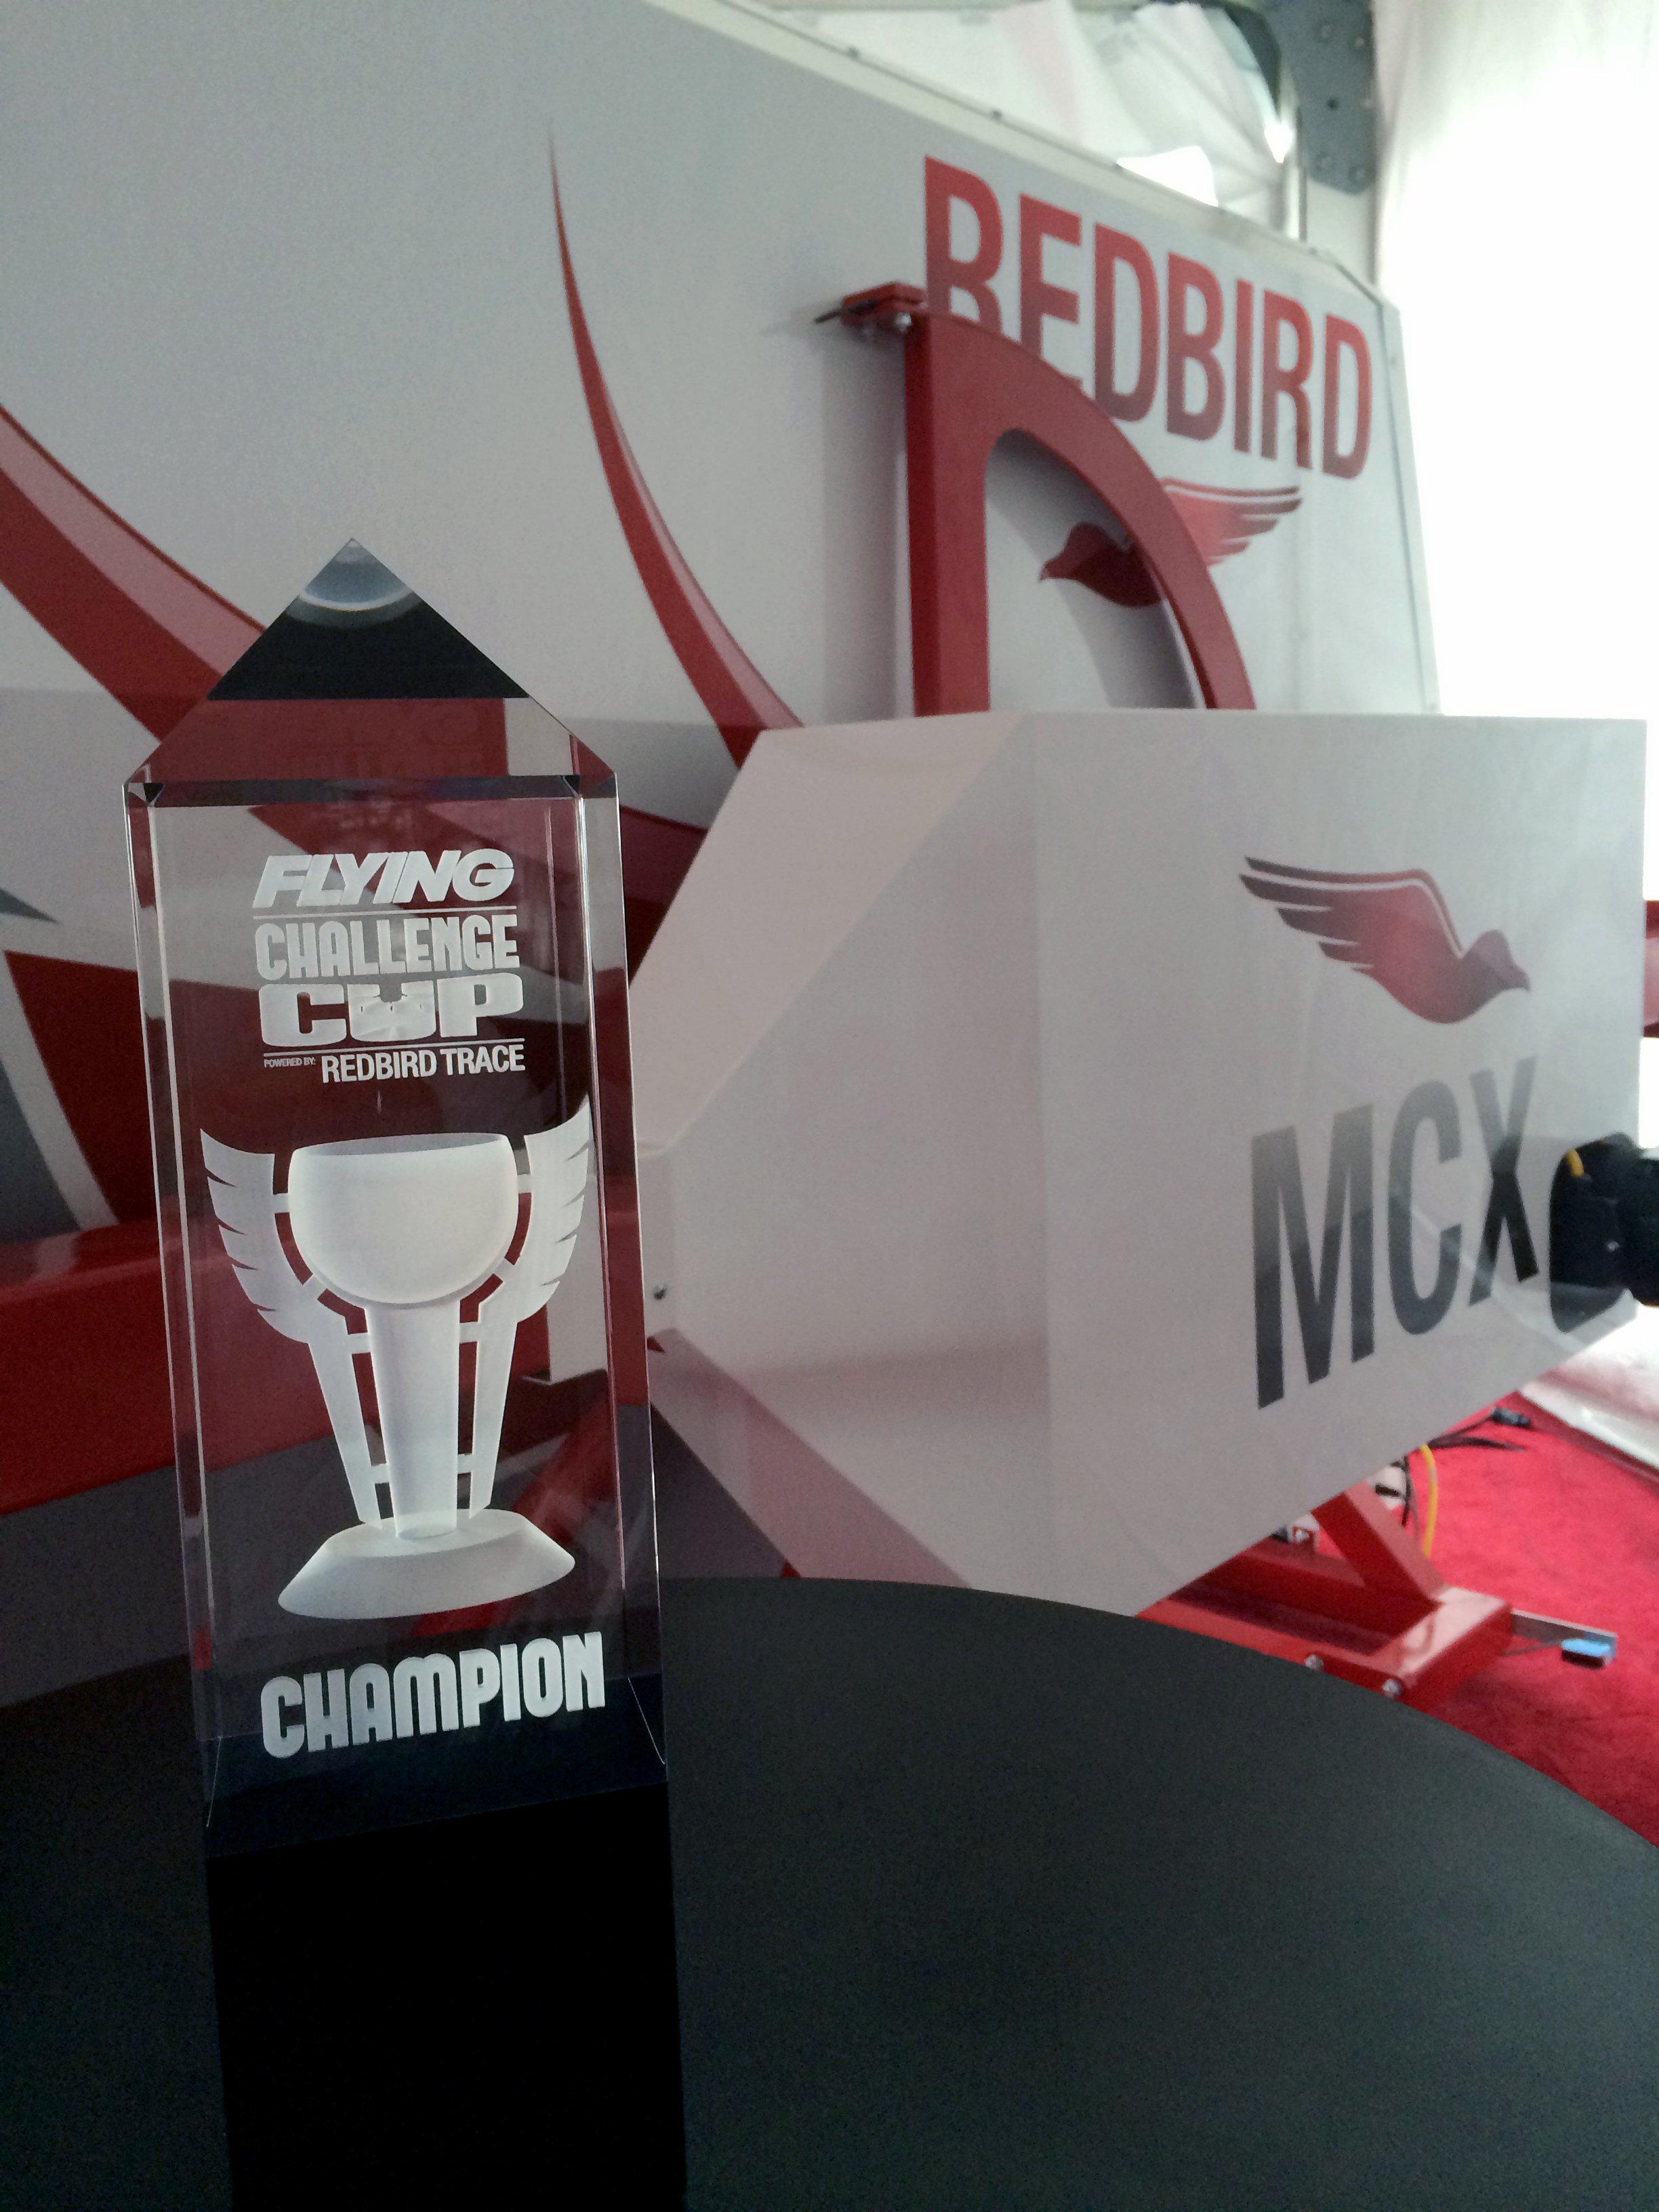 Flying Challenge Cup World Championship at Oshkosh